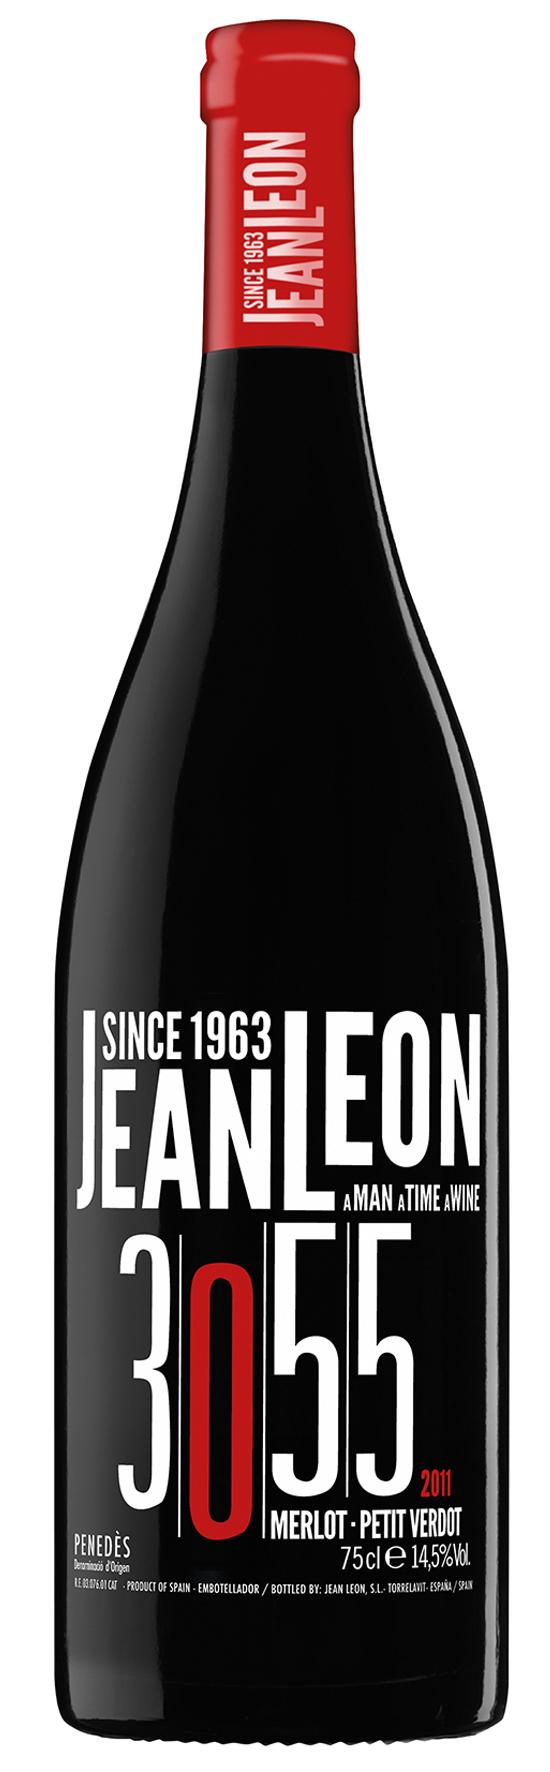 "2015 Jean Leon ""3055"" Merlot-Petit Verdot"